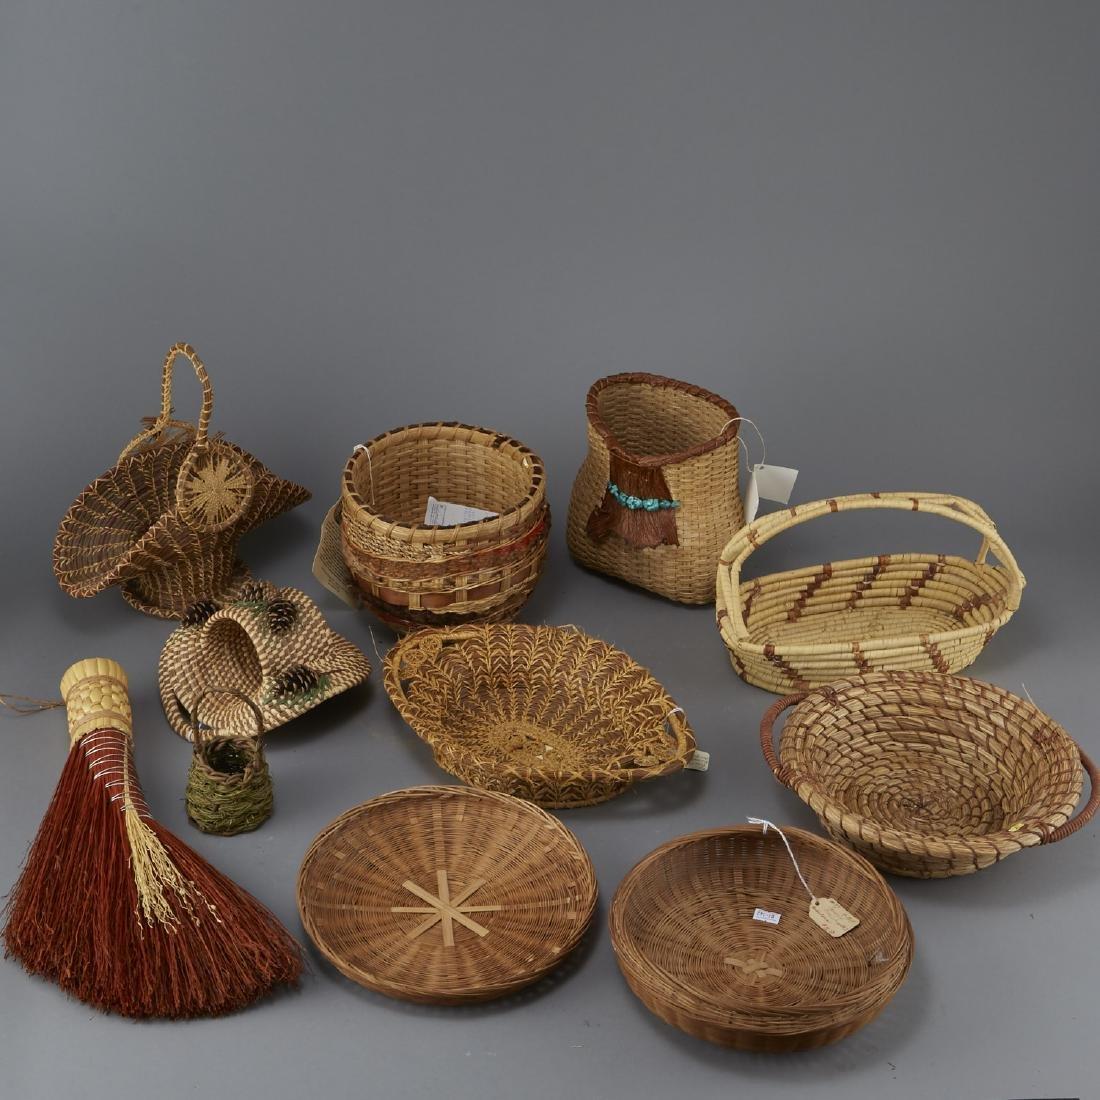 11 Woven Pieces of Native American Origin